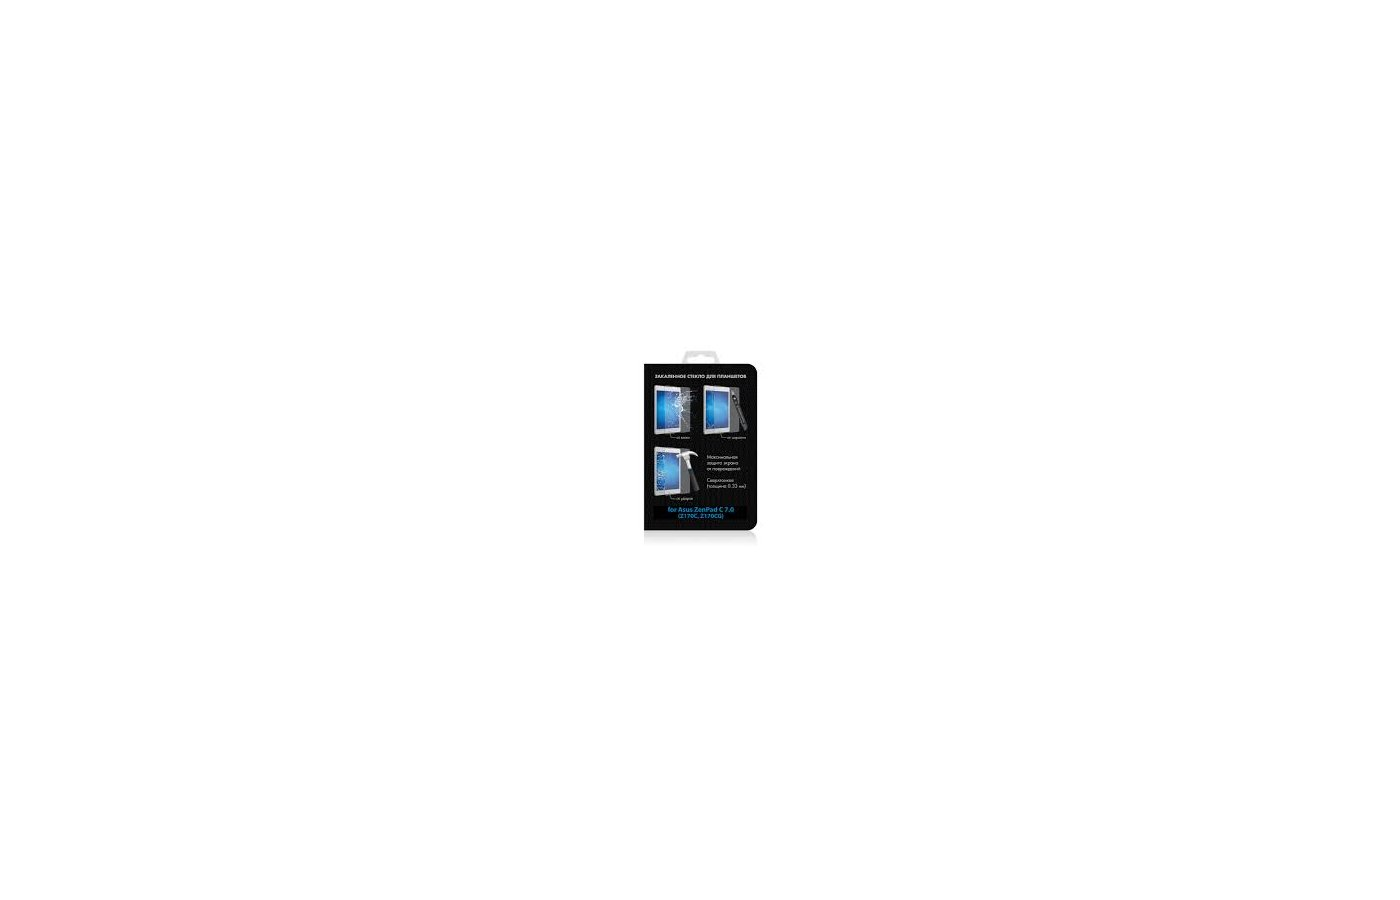 Защитная пленка DF Стекло для Asus ZenPad C 7.0 (Z170C/Z170CG) aSteel-13